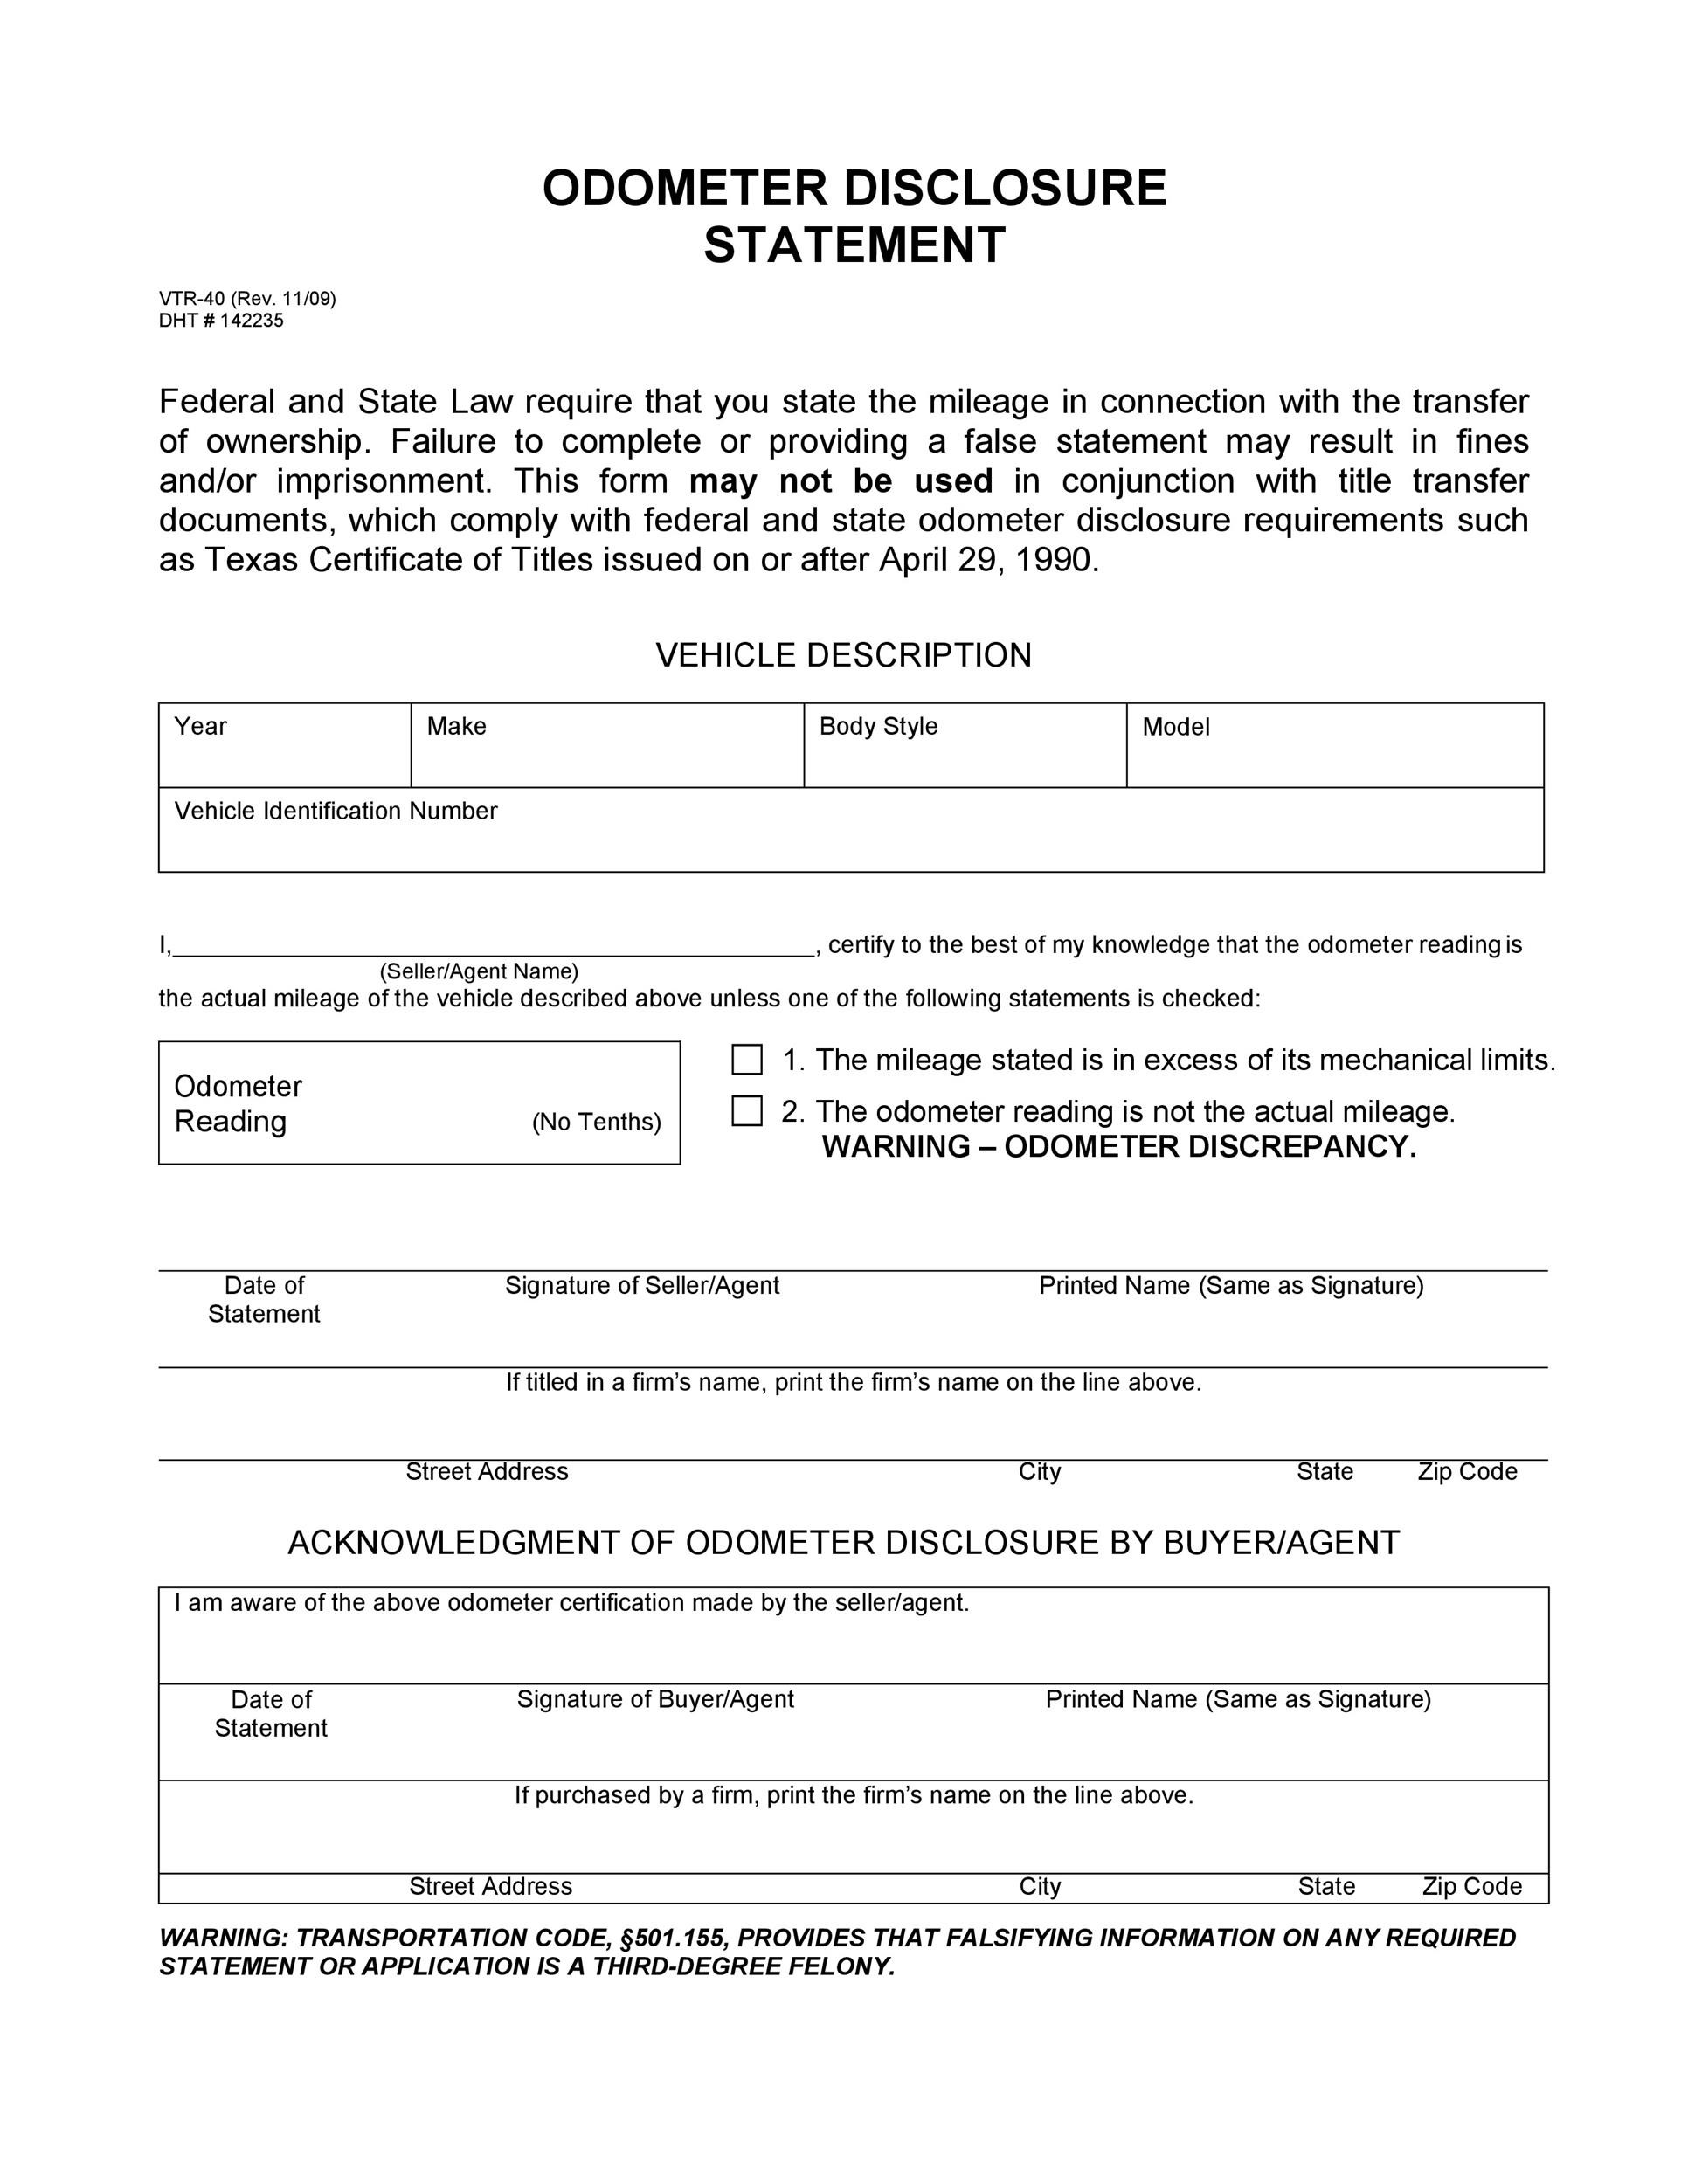 Free odometer disclosure statement 30